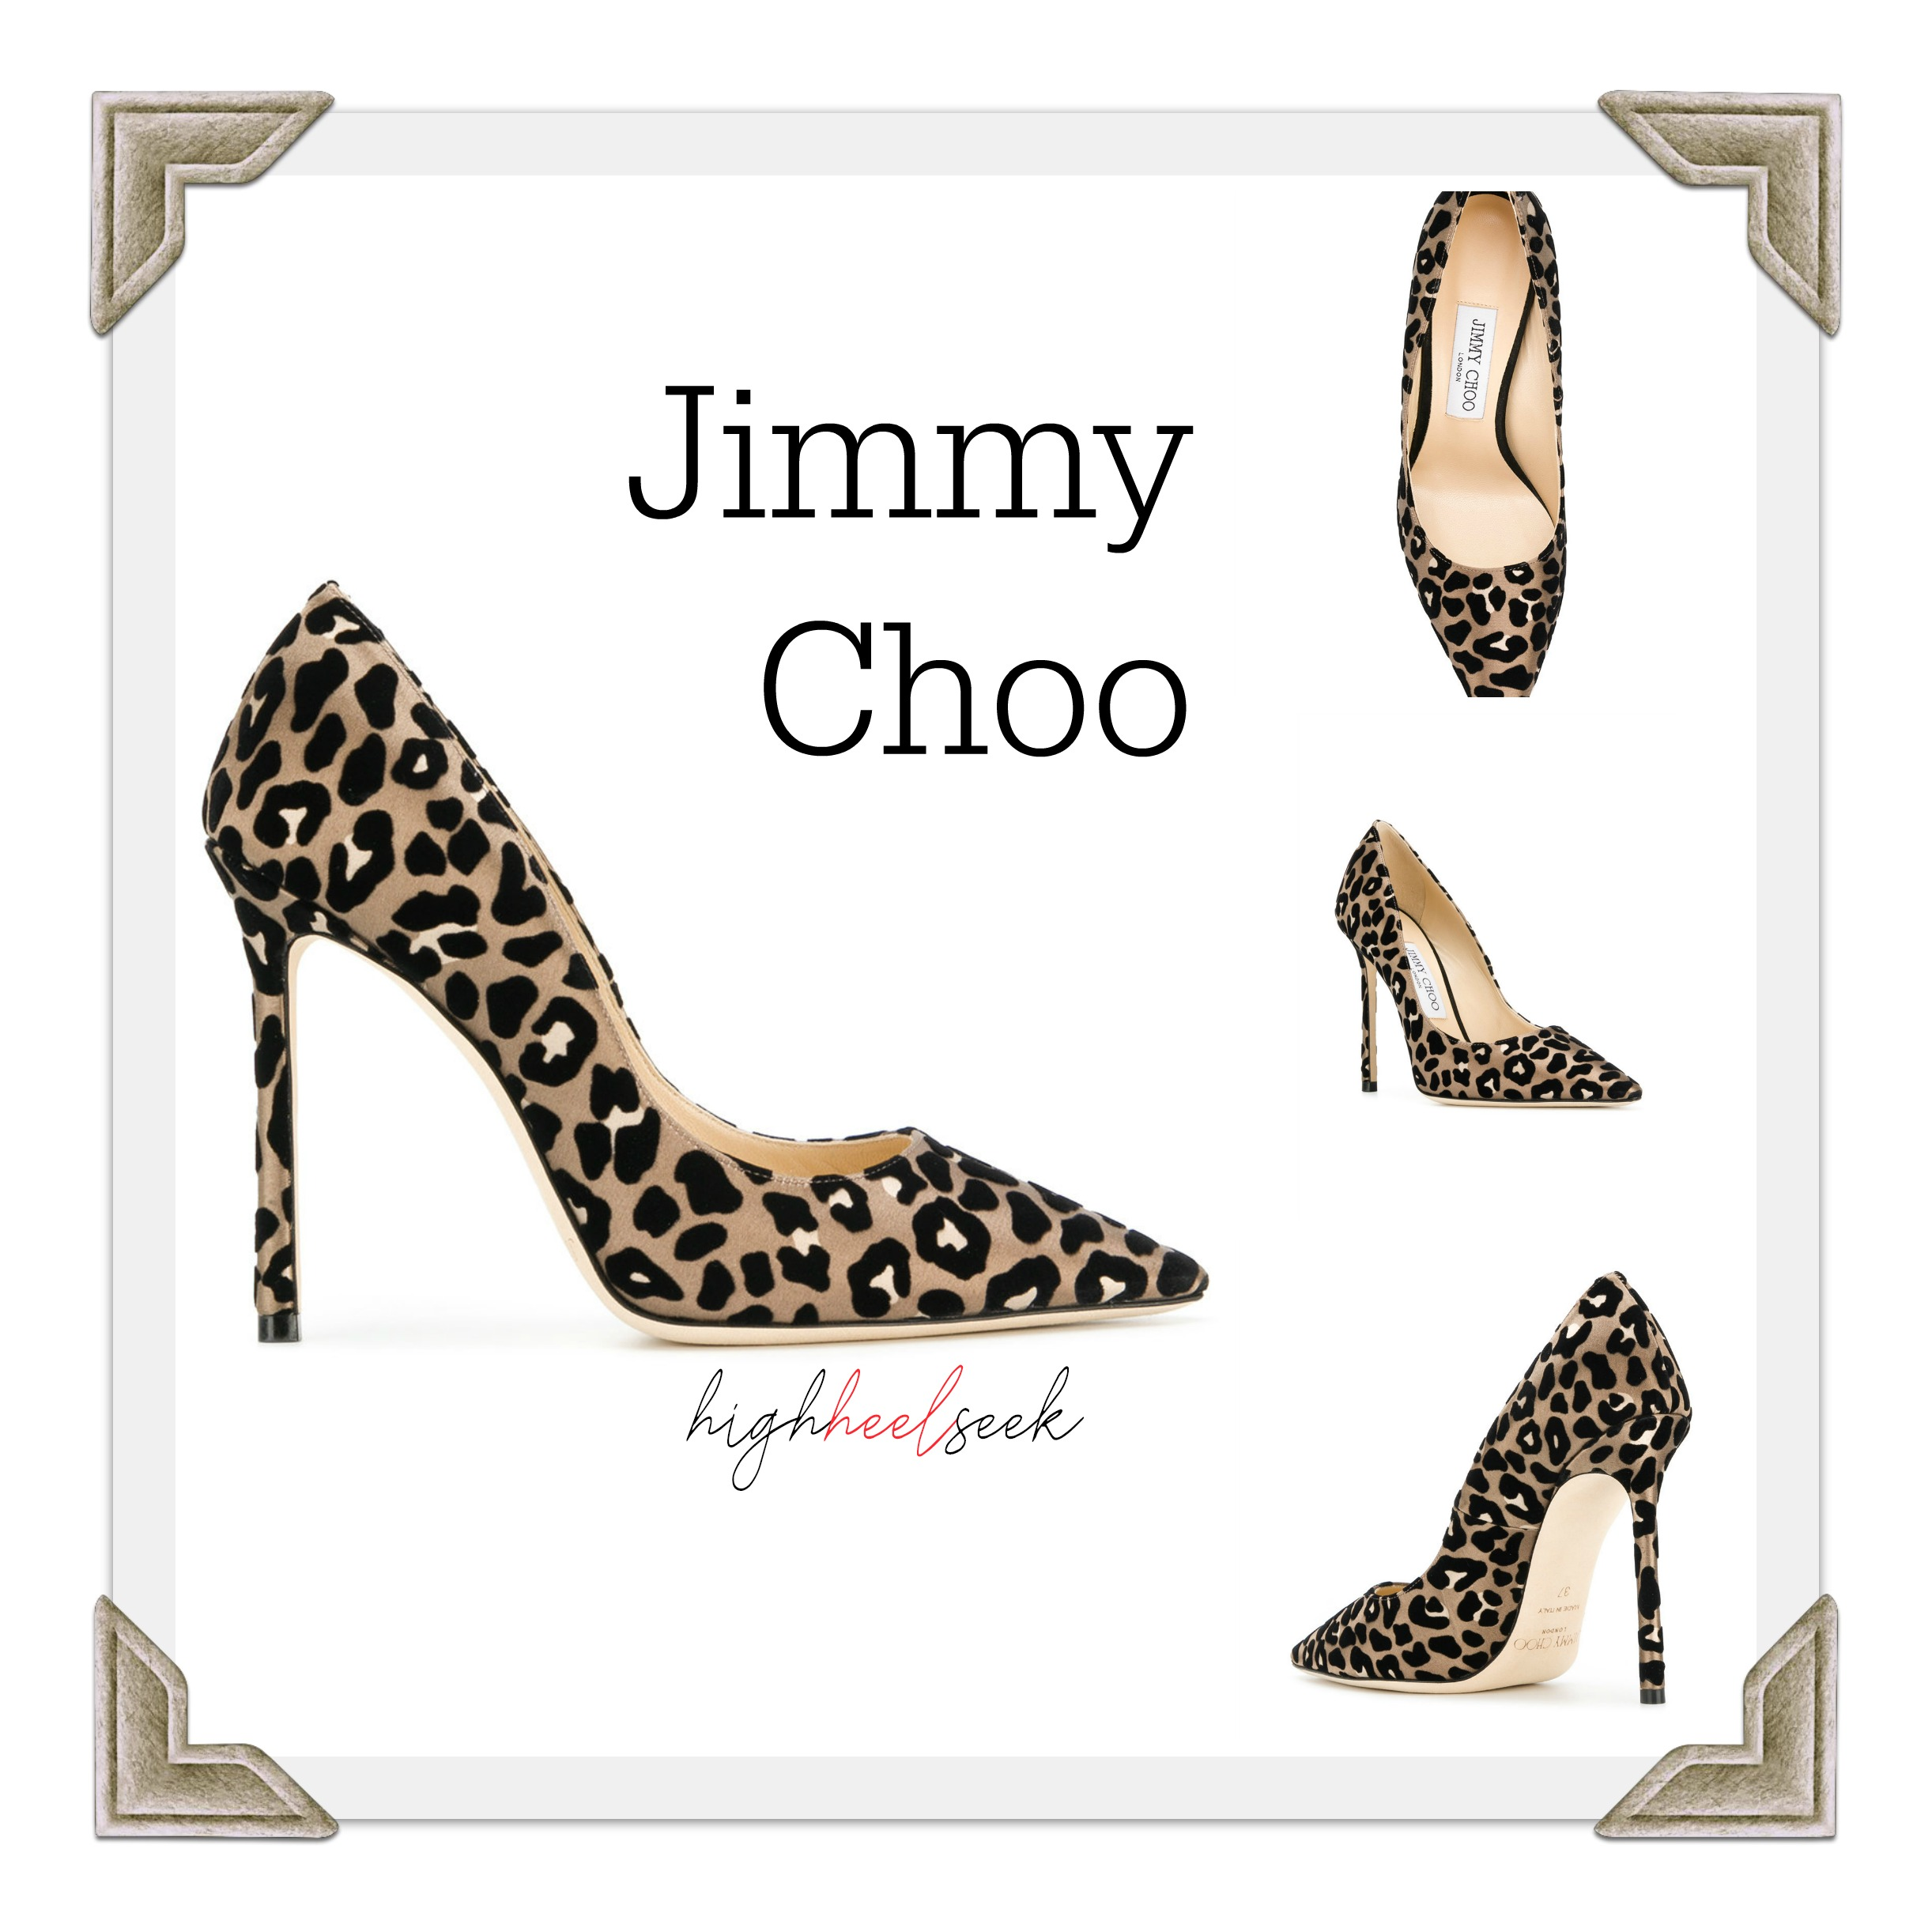 42a84e8ae1cb Jimmy Choo Heels, Romy Pumps in Leopard Print Heels Designer Shoes,  Designer Brand Heels